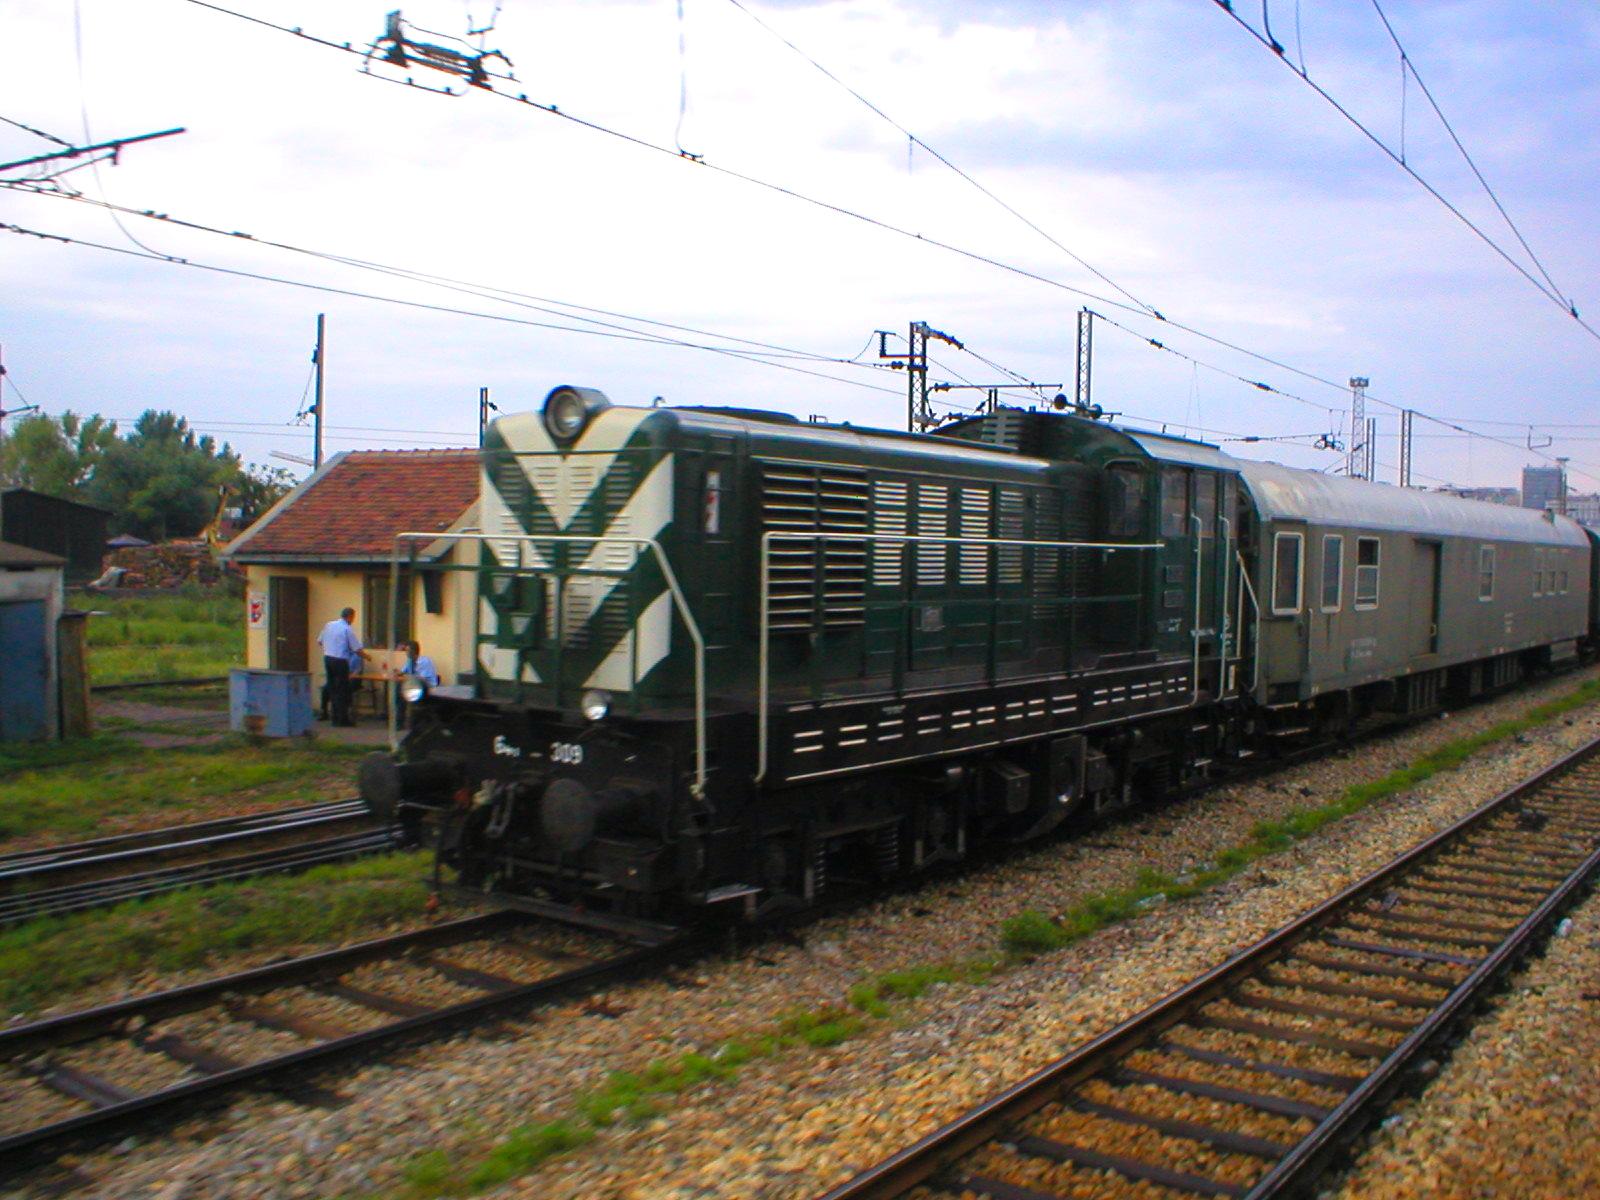 J%C5%BD_641_series_locomotive_(01).jpg